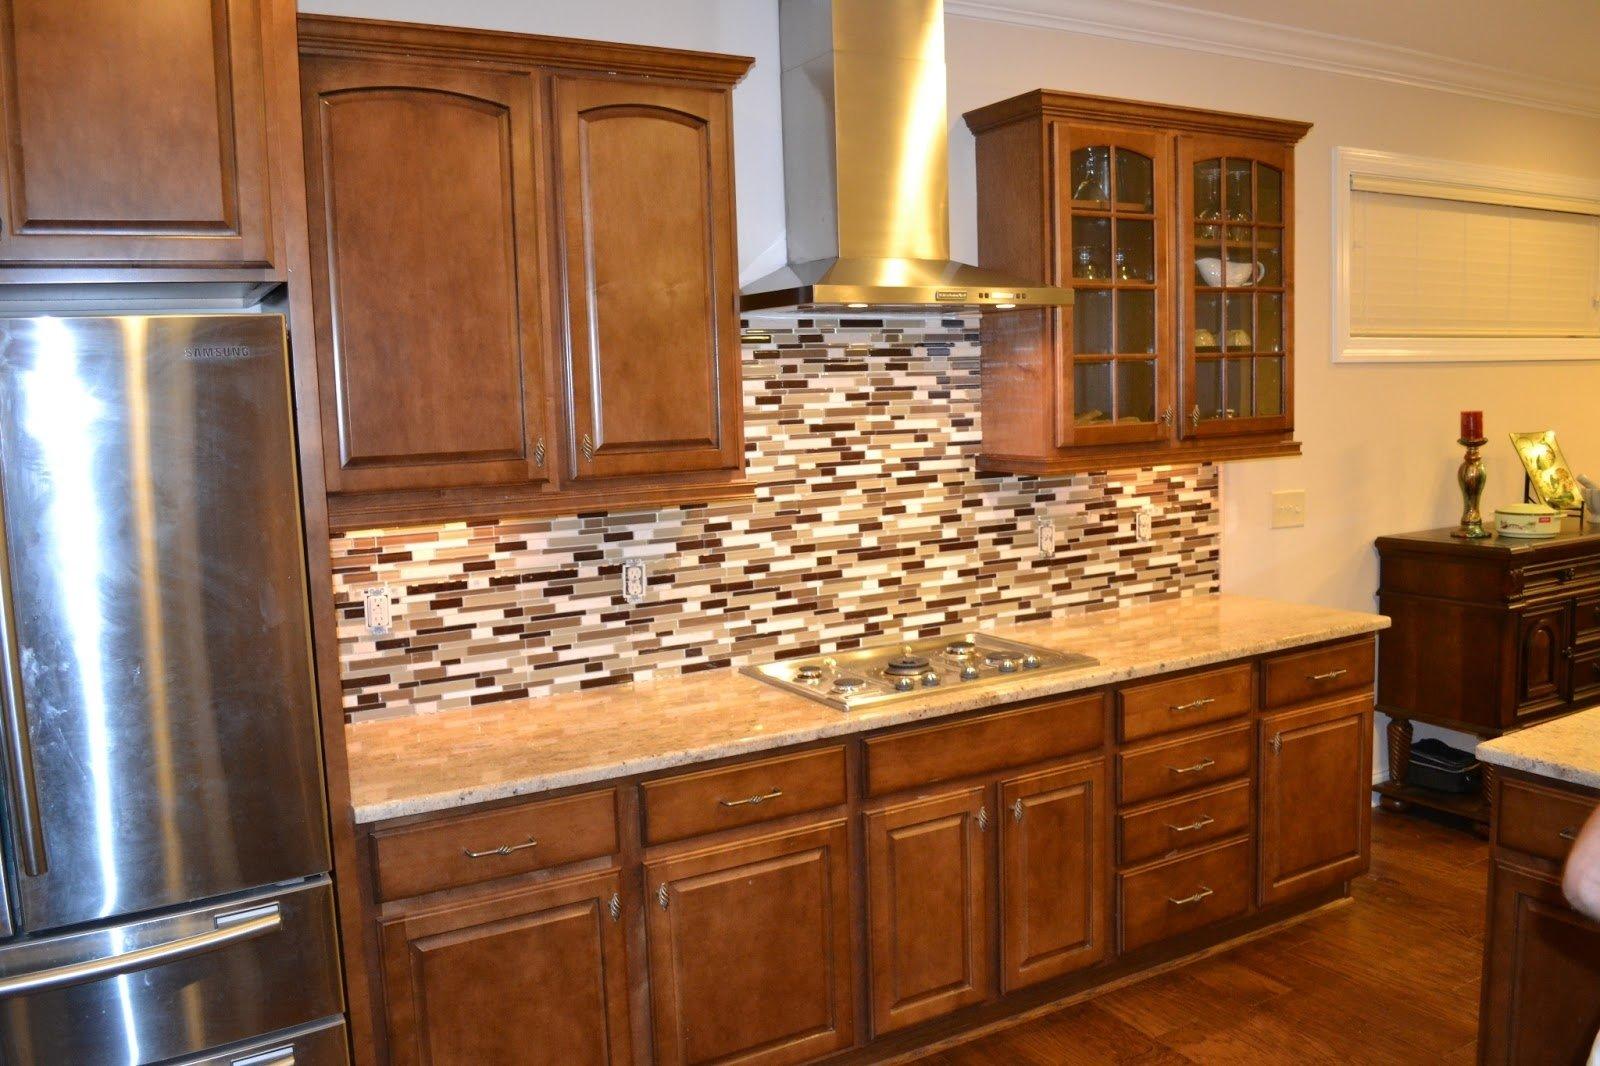 10 Best Kitchen Ideas With Oak Cabinets decorating ideas kitchens oak cabinets colors with oak cabinets 2020